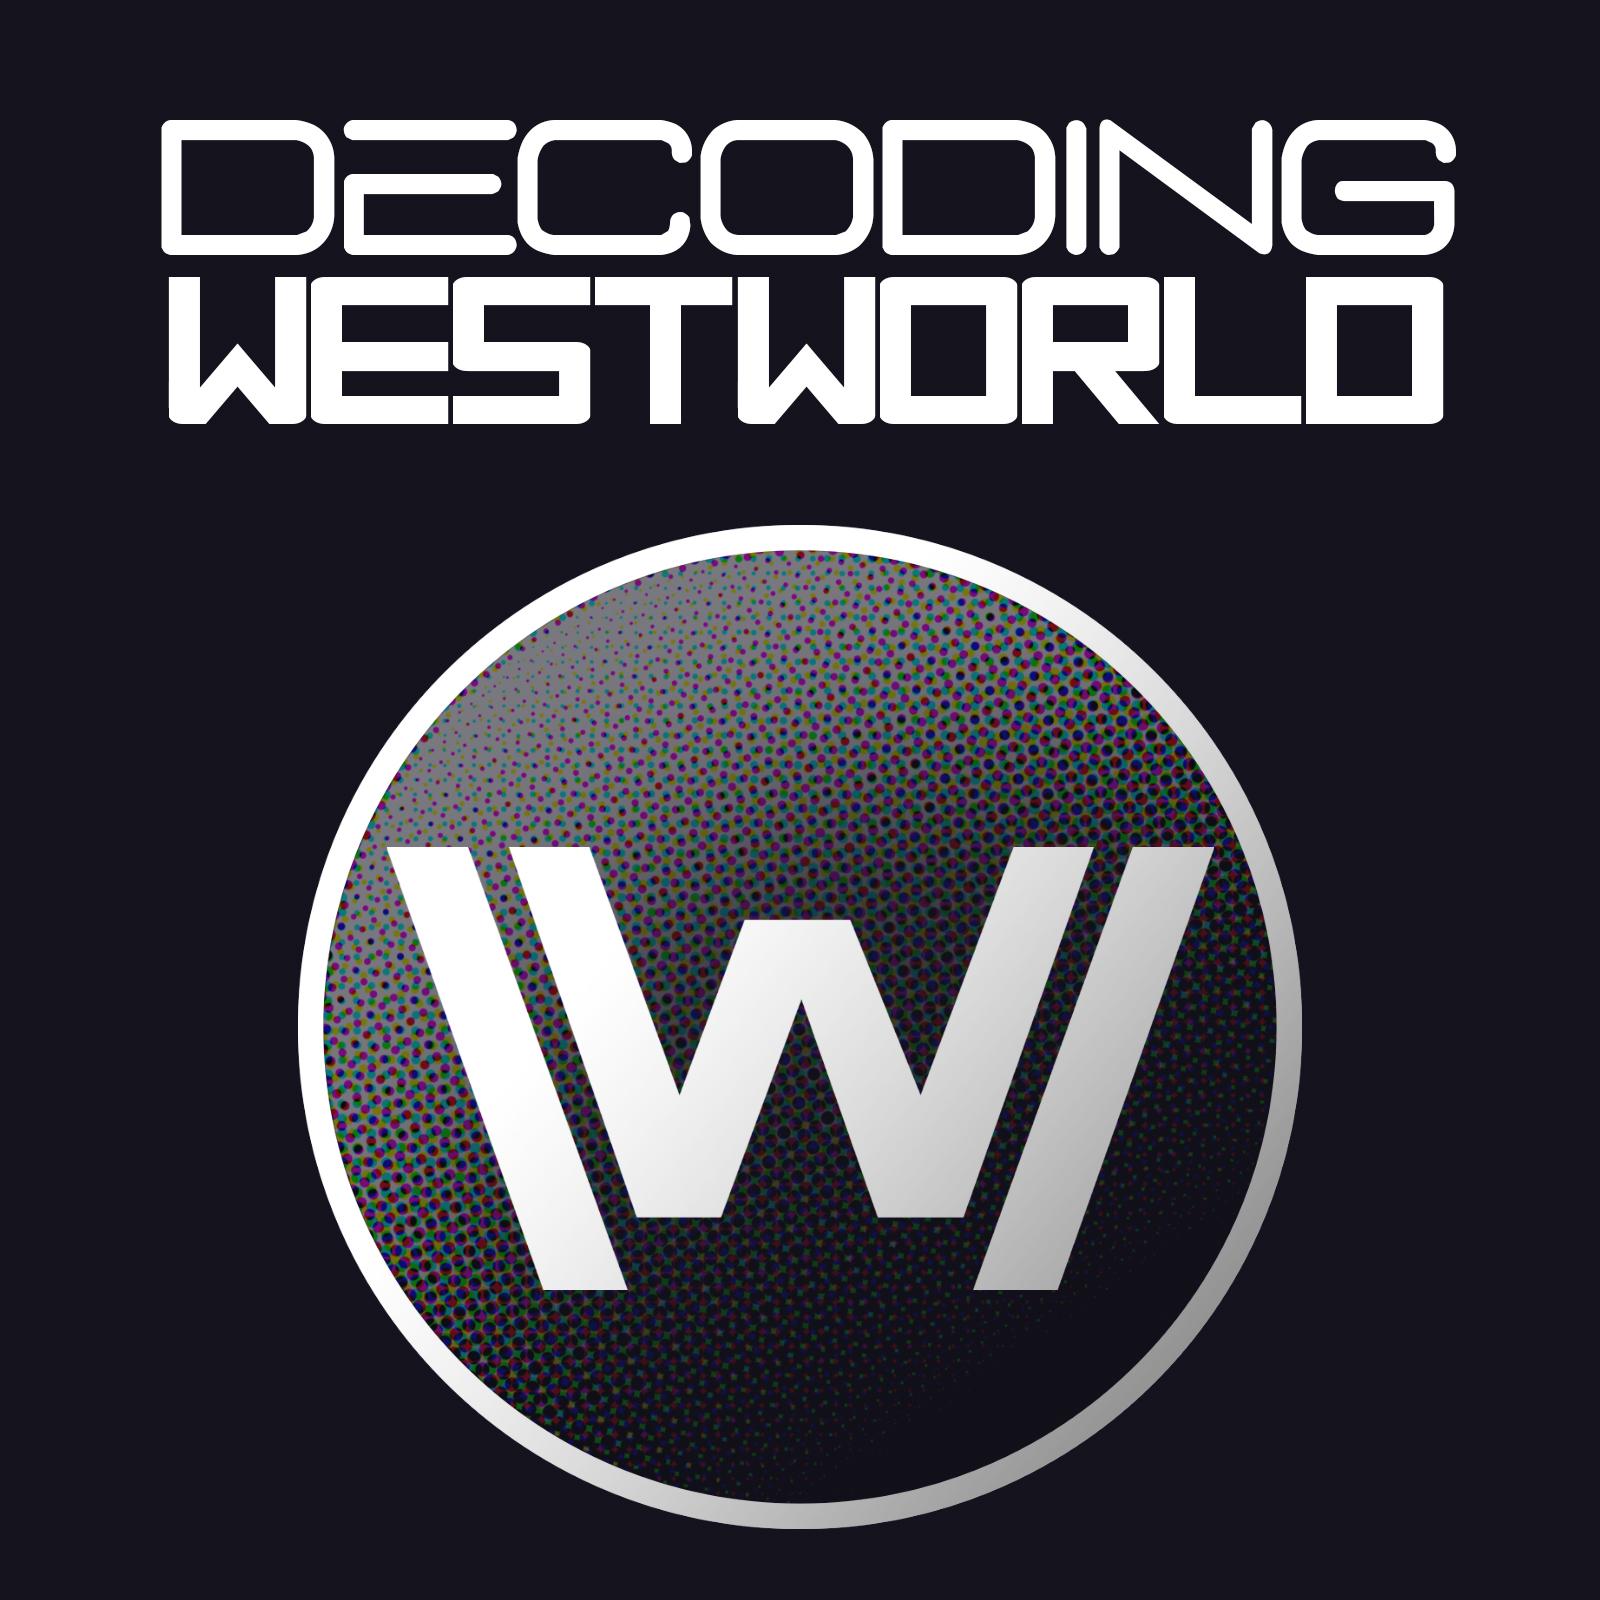 Decoding Westworld show art